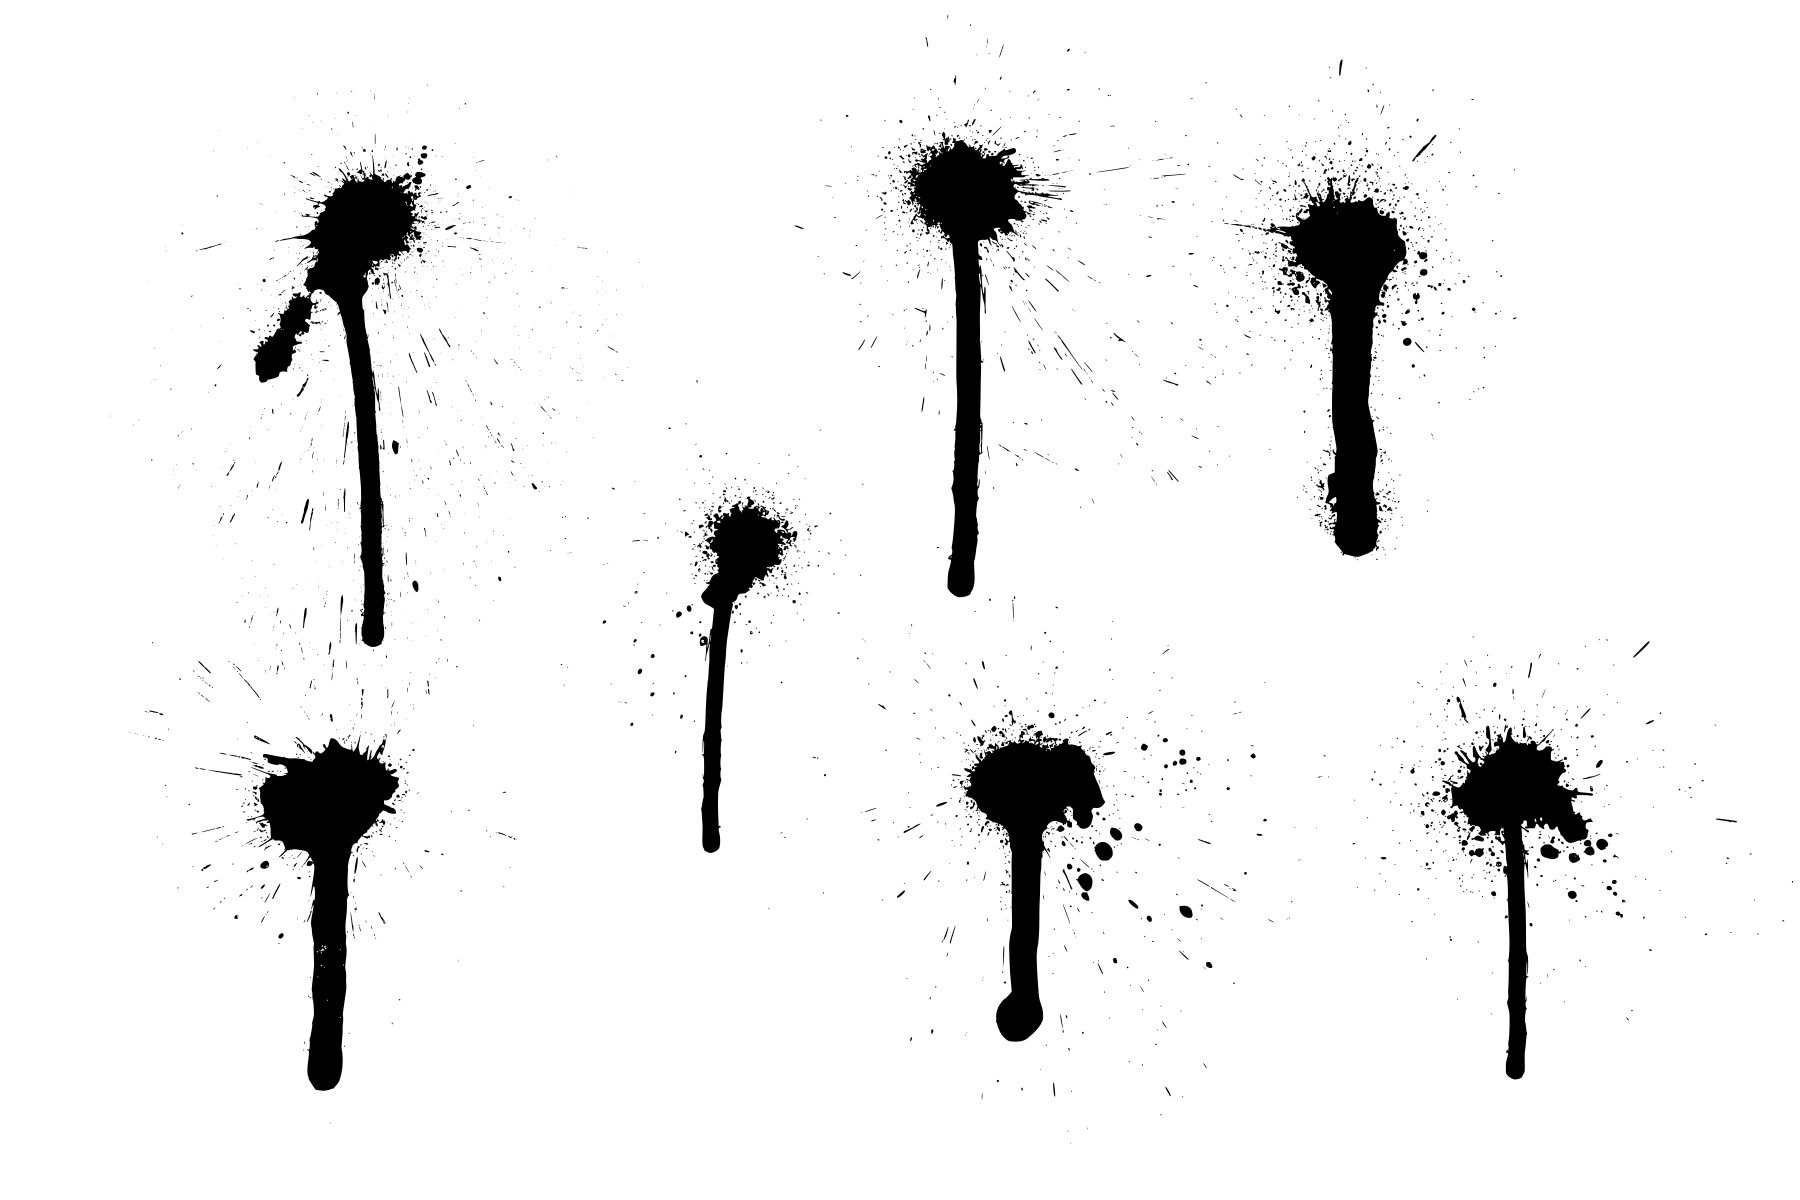 7 Spray Paint Drip (PNG Transparent).